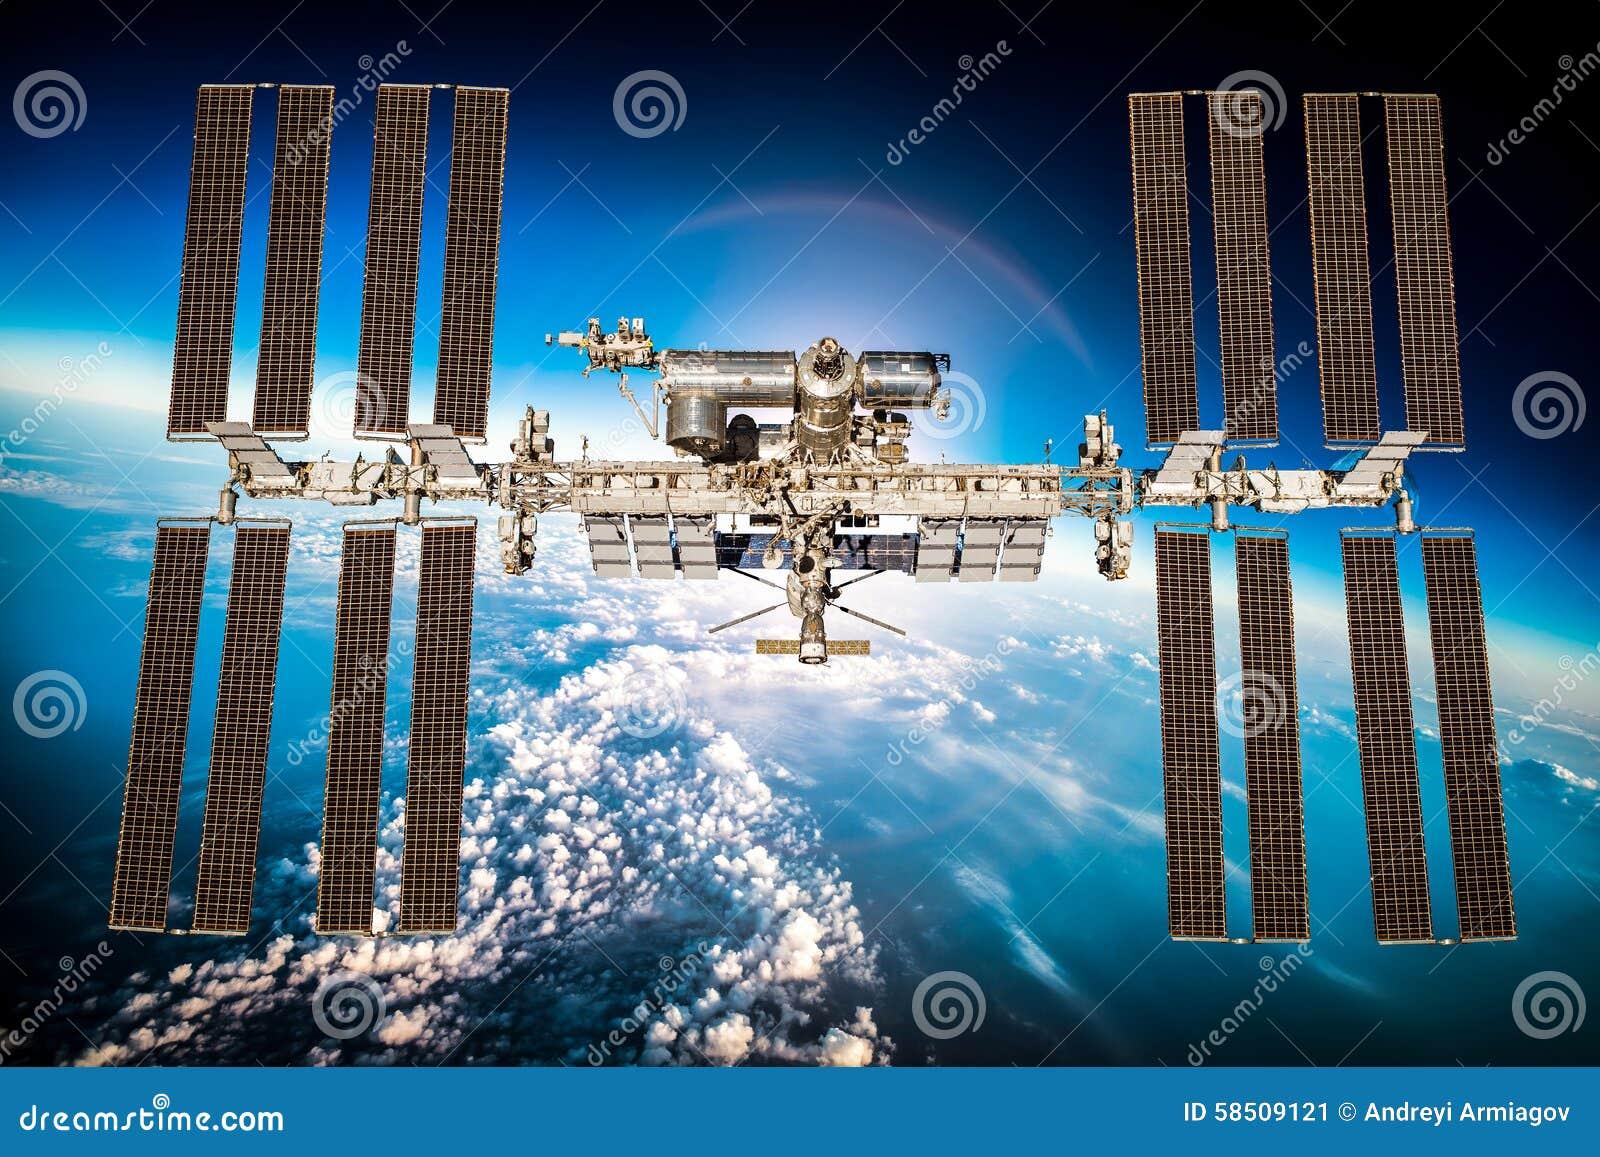 International Space Station Stock Photo - Image: 58509121